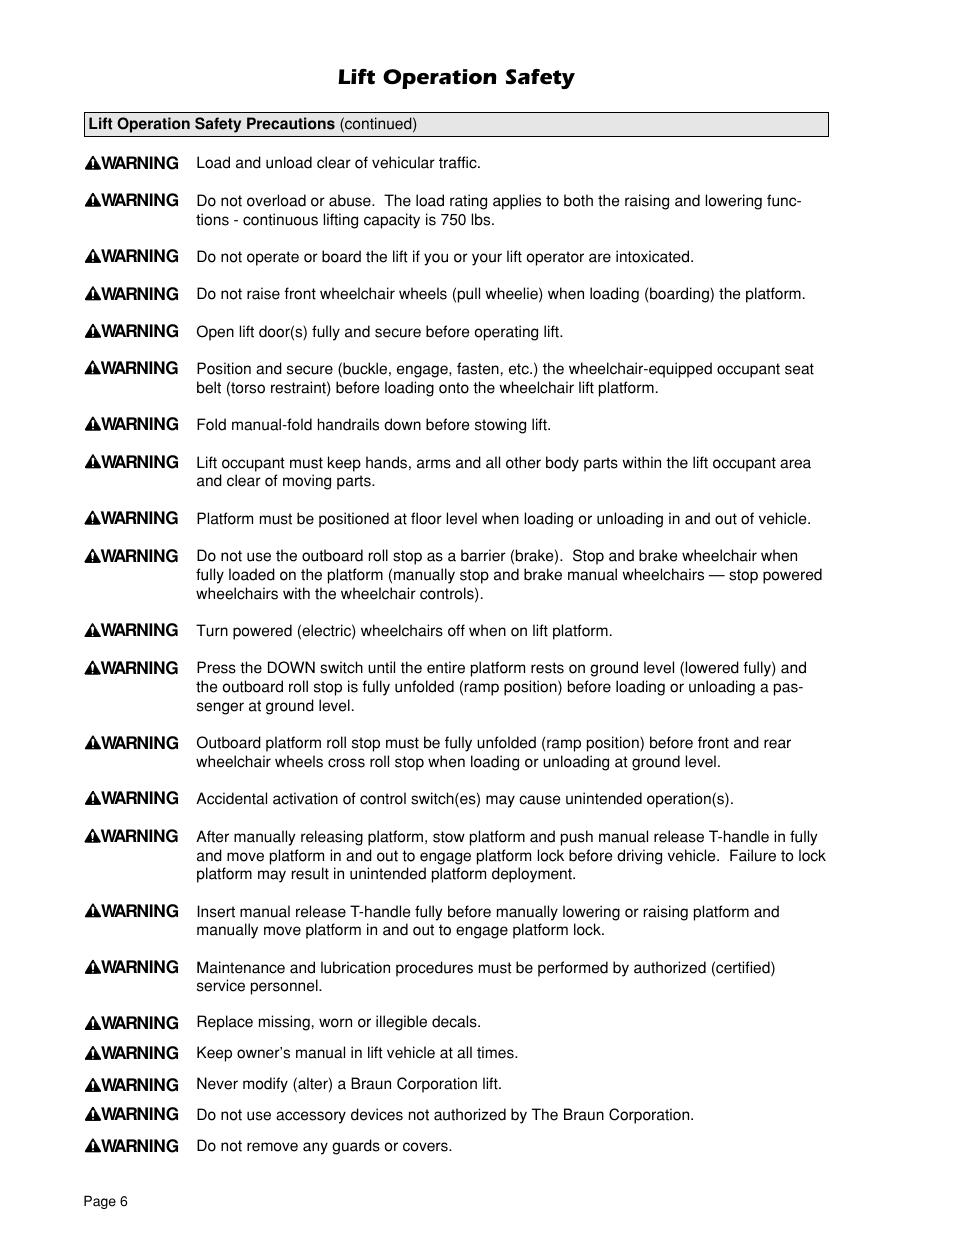 Lift Operation Safety Braun Uvl 604xb User Manual Page